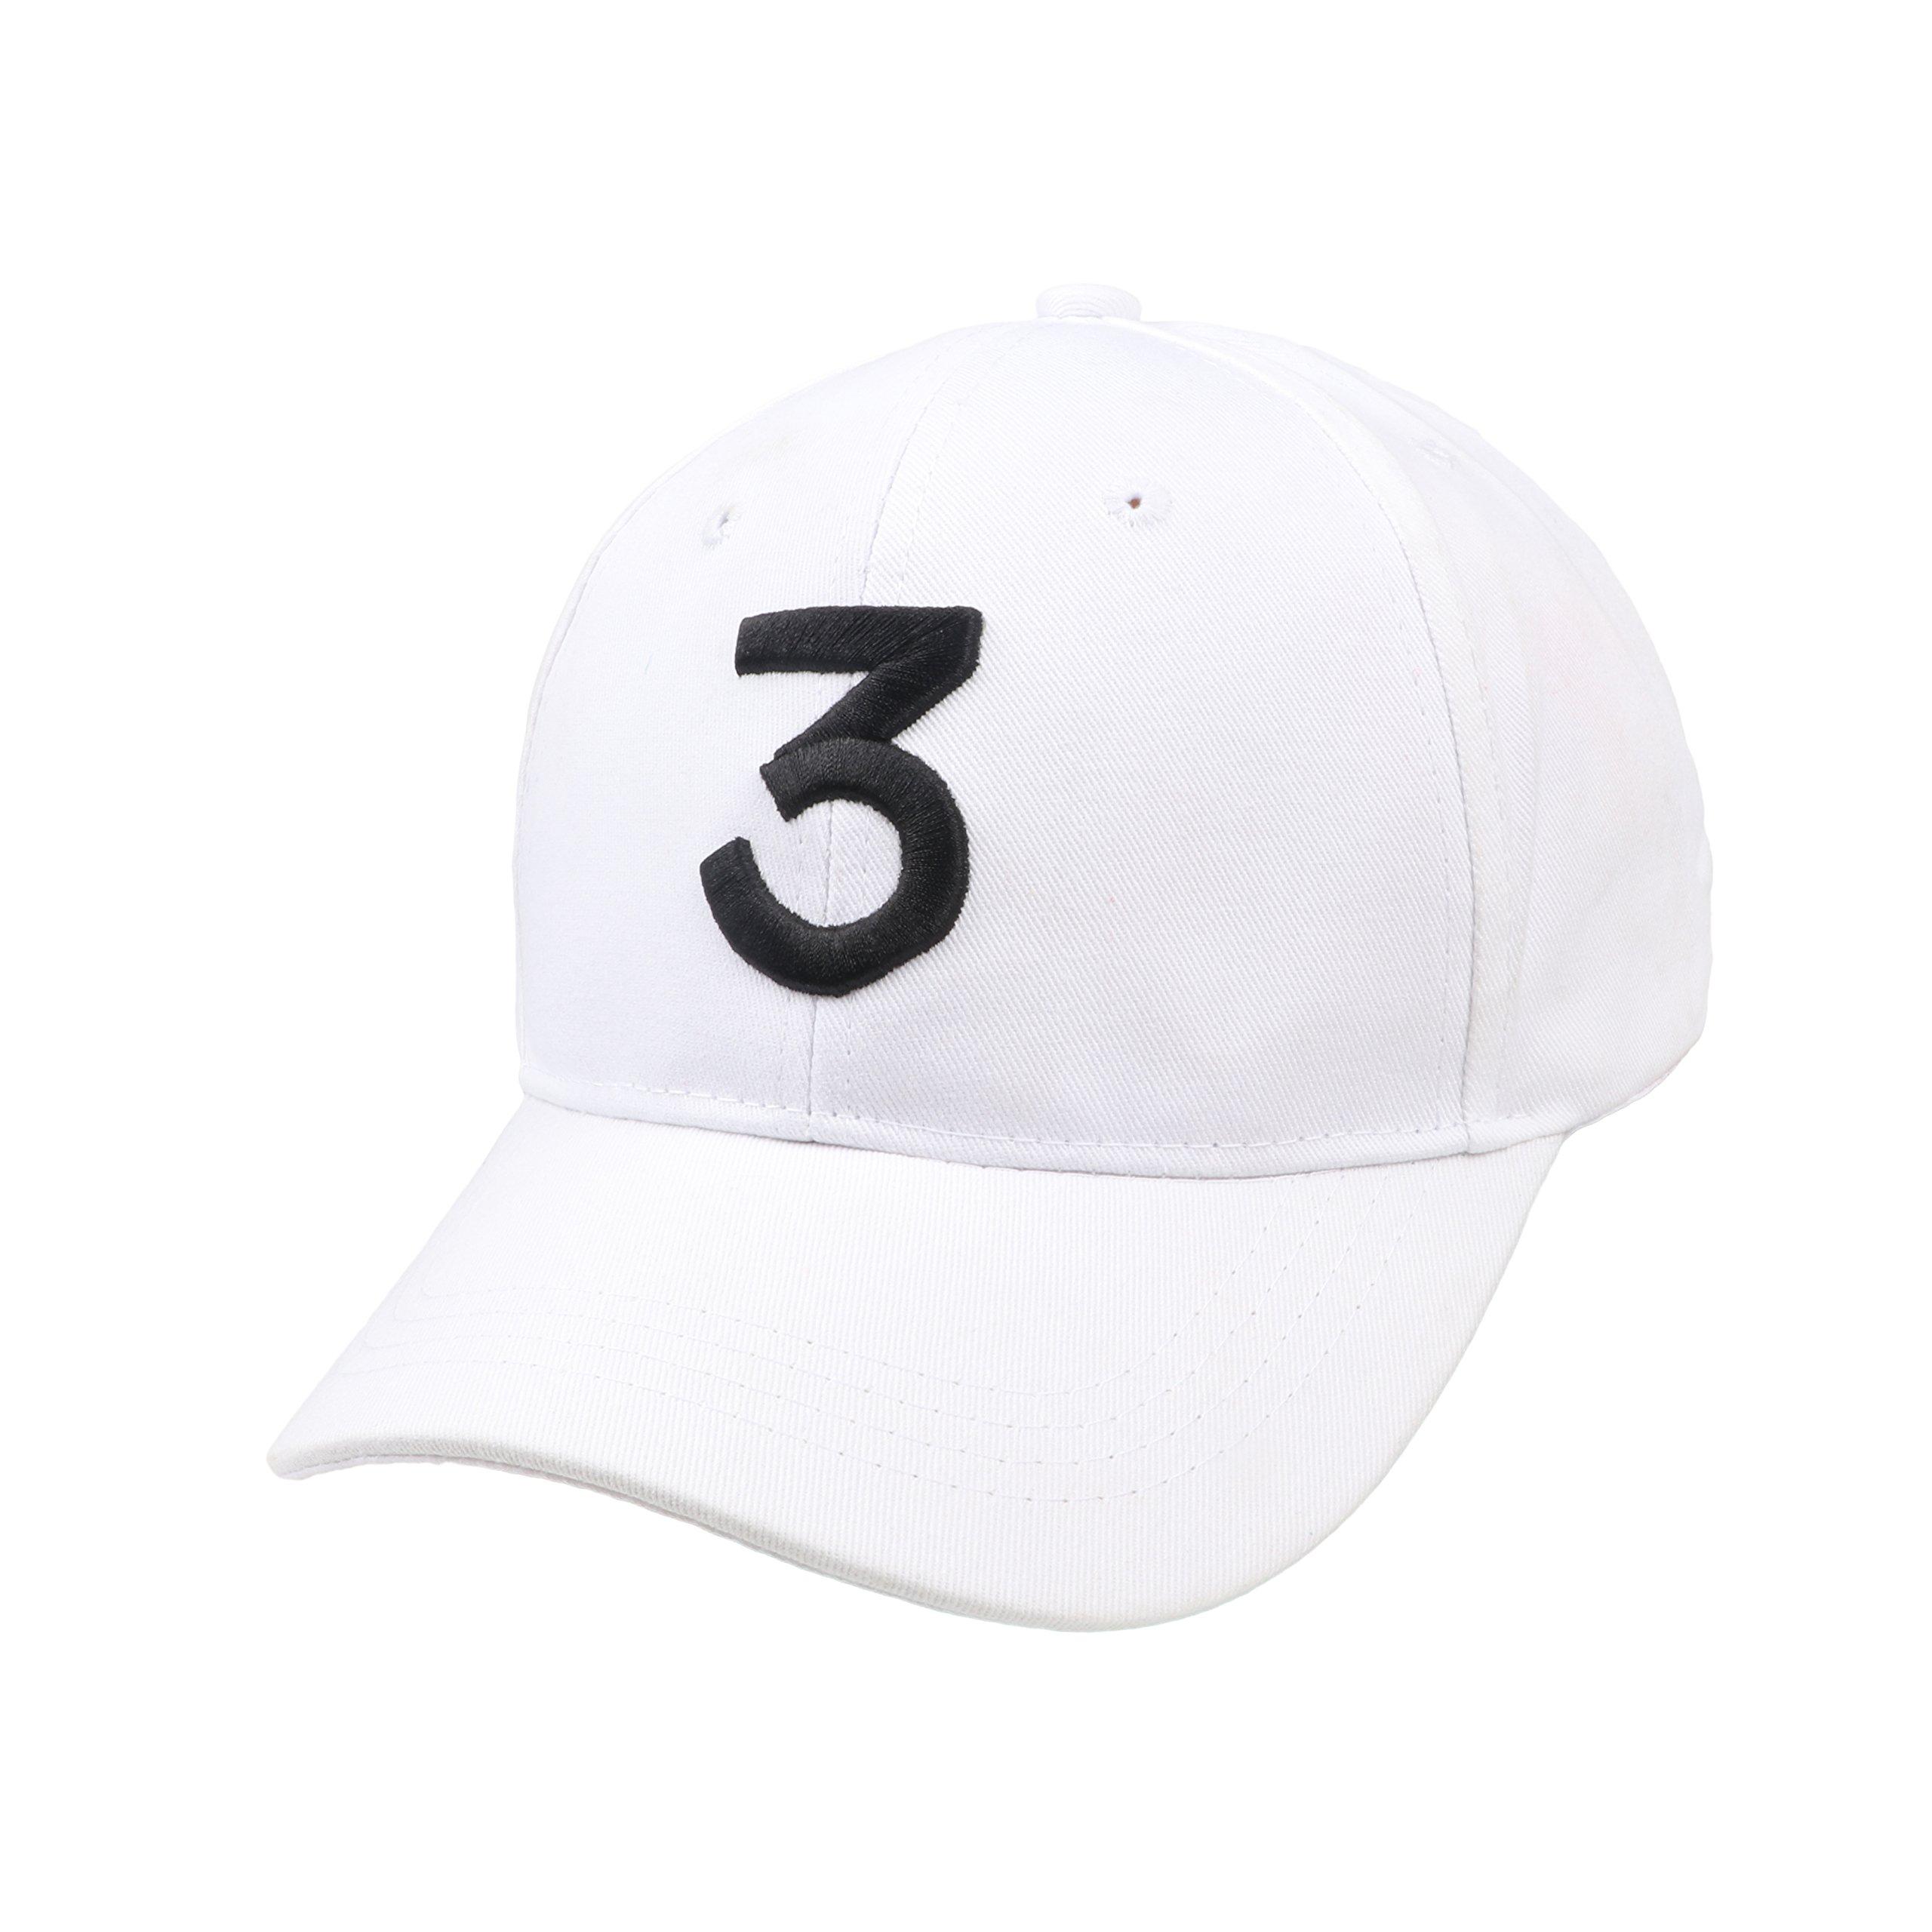 Embroider Hats Number 3 Cool Baseball Caps, Hip Hop Casquette, Adjustable sunbonnet Cotton Polo Style Low Profile Plain Caps, FREE, White